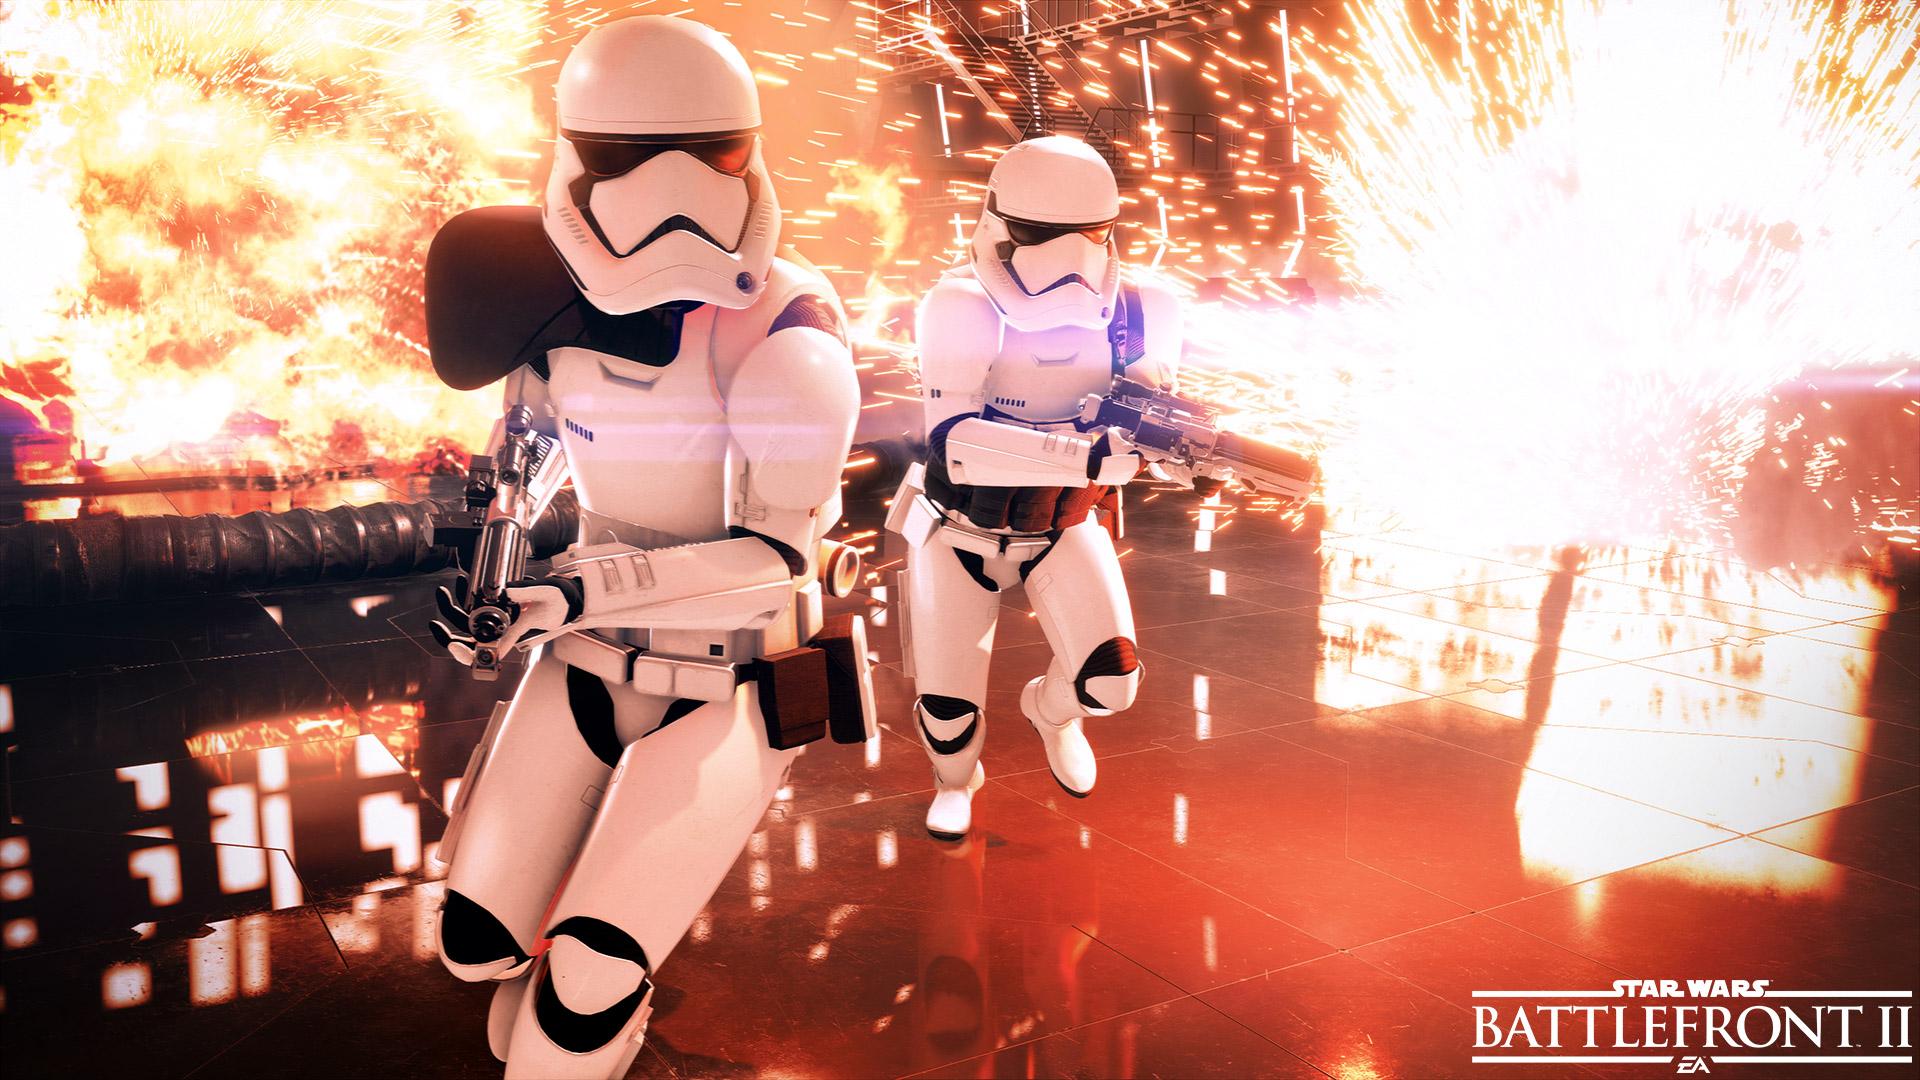 Star Wars Battlefront Ii 2017 1 Hd Games 4k Wallpapers Images